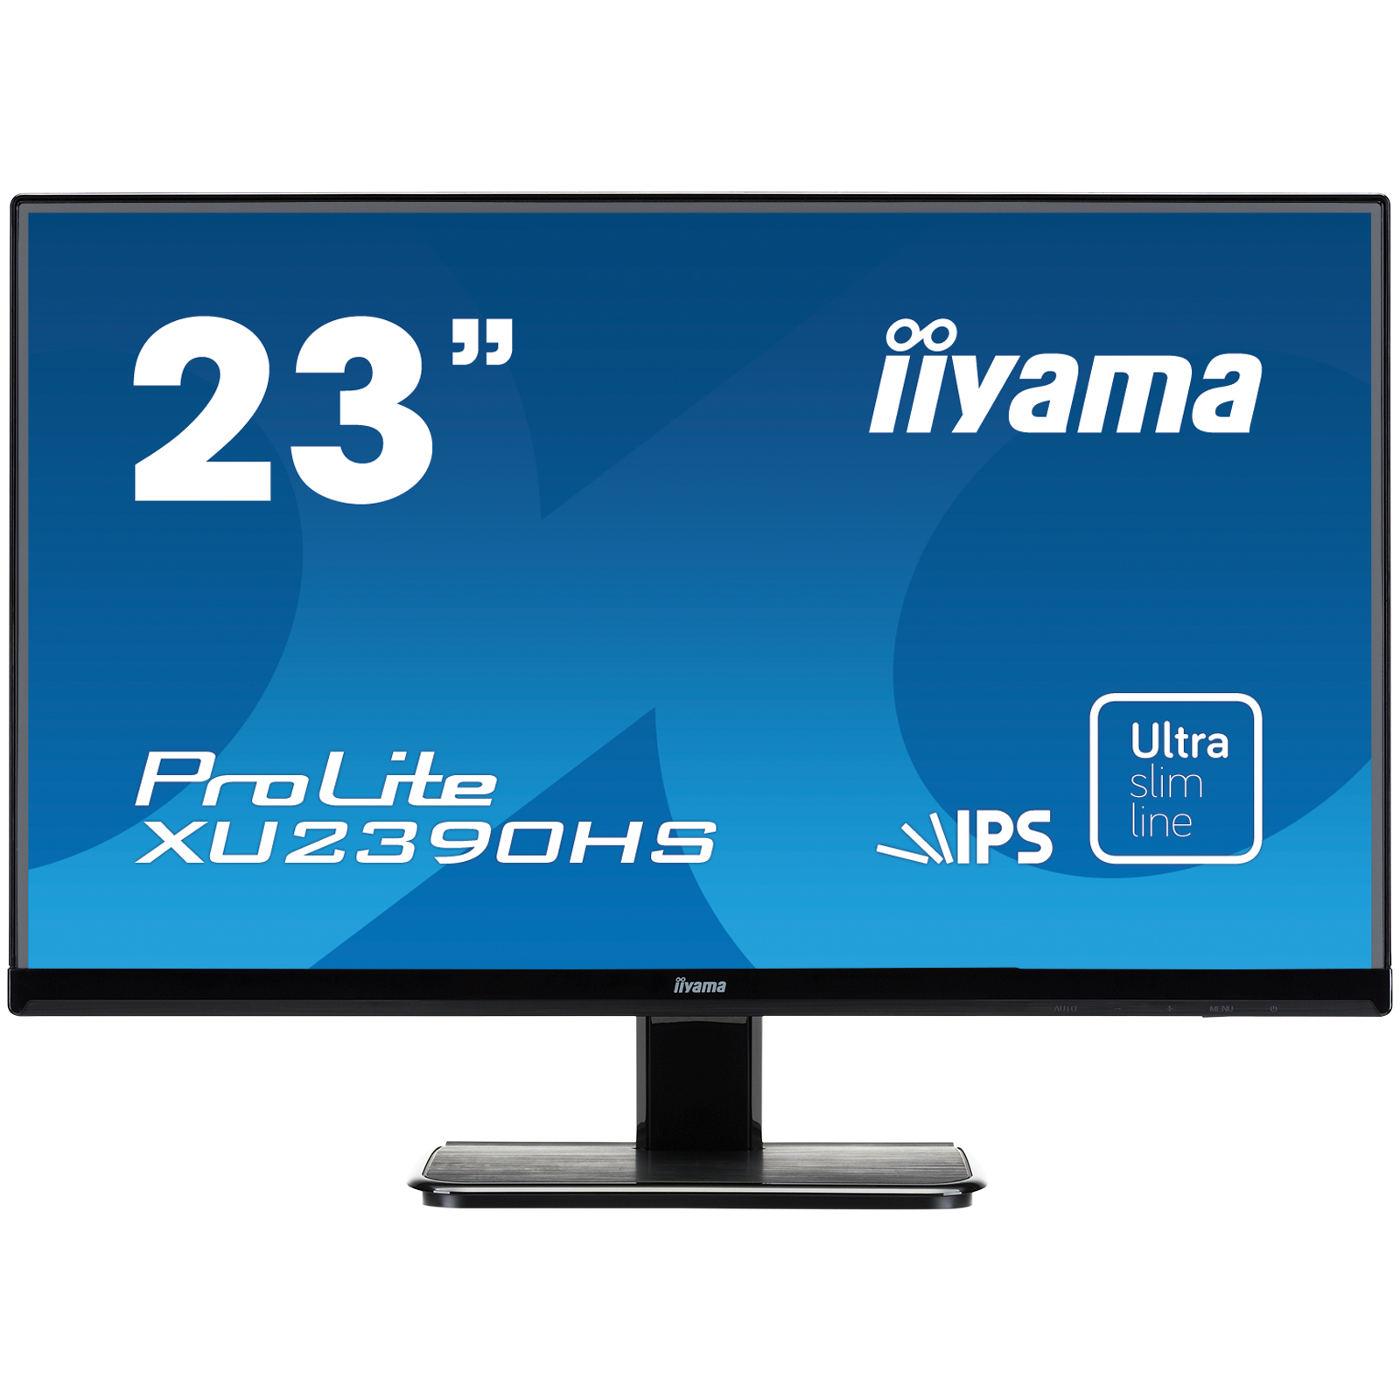 "Ecran PC iiyama 23"" LED - ProLite XU2390HS-1 1920 x 1080 pixels - 5 ms - Format large 16/9 - Dalle IPS - HDMI - Noir"